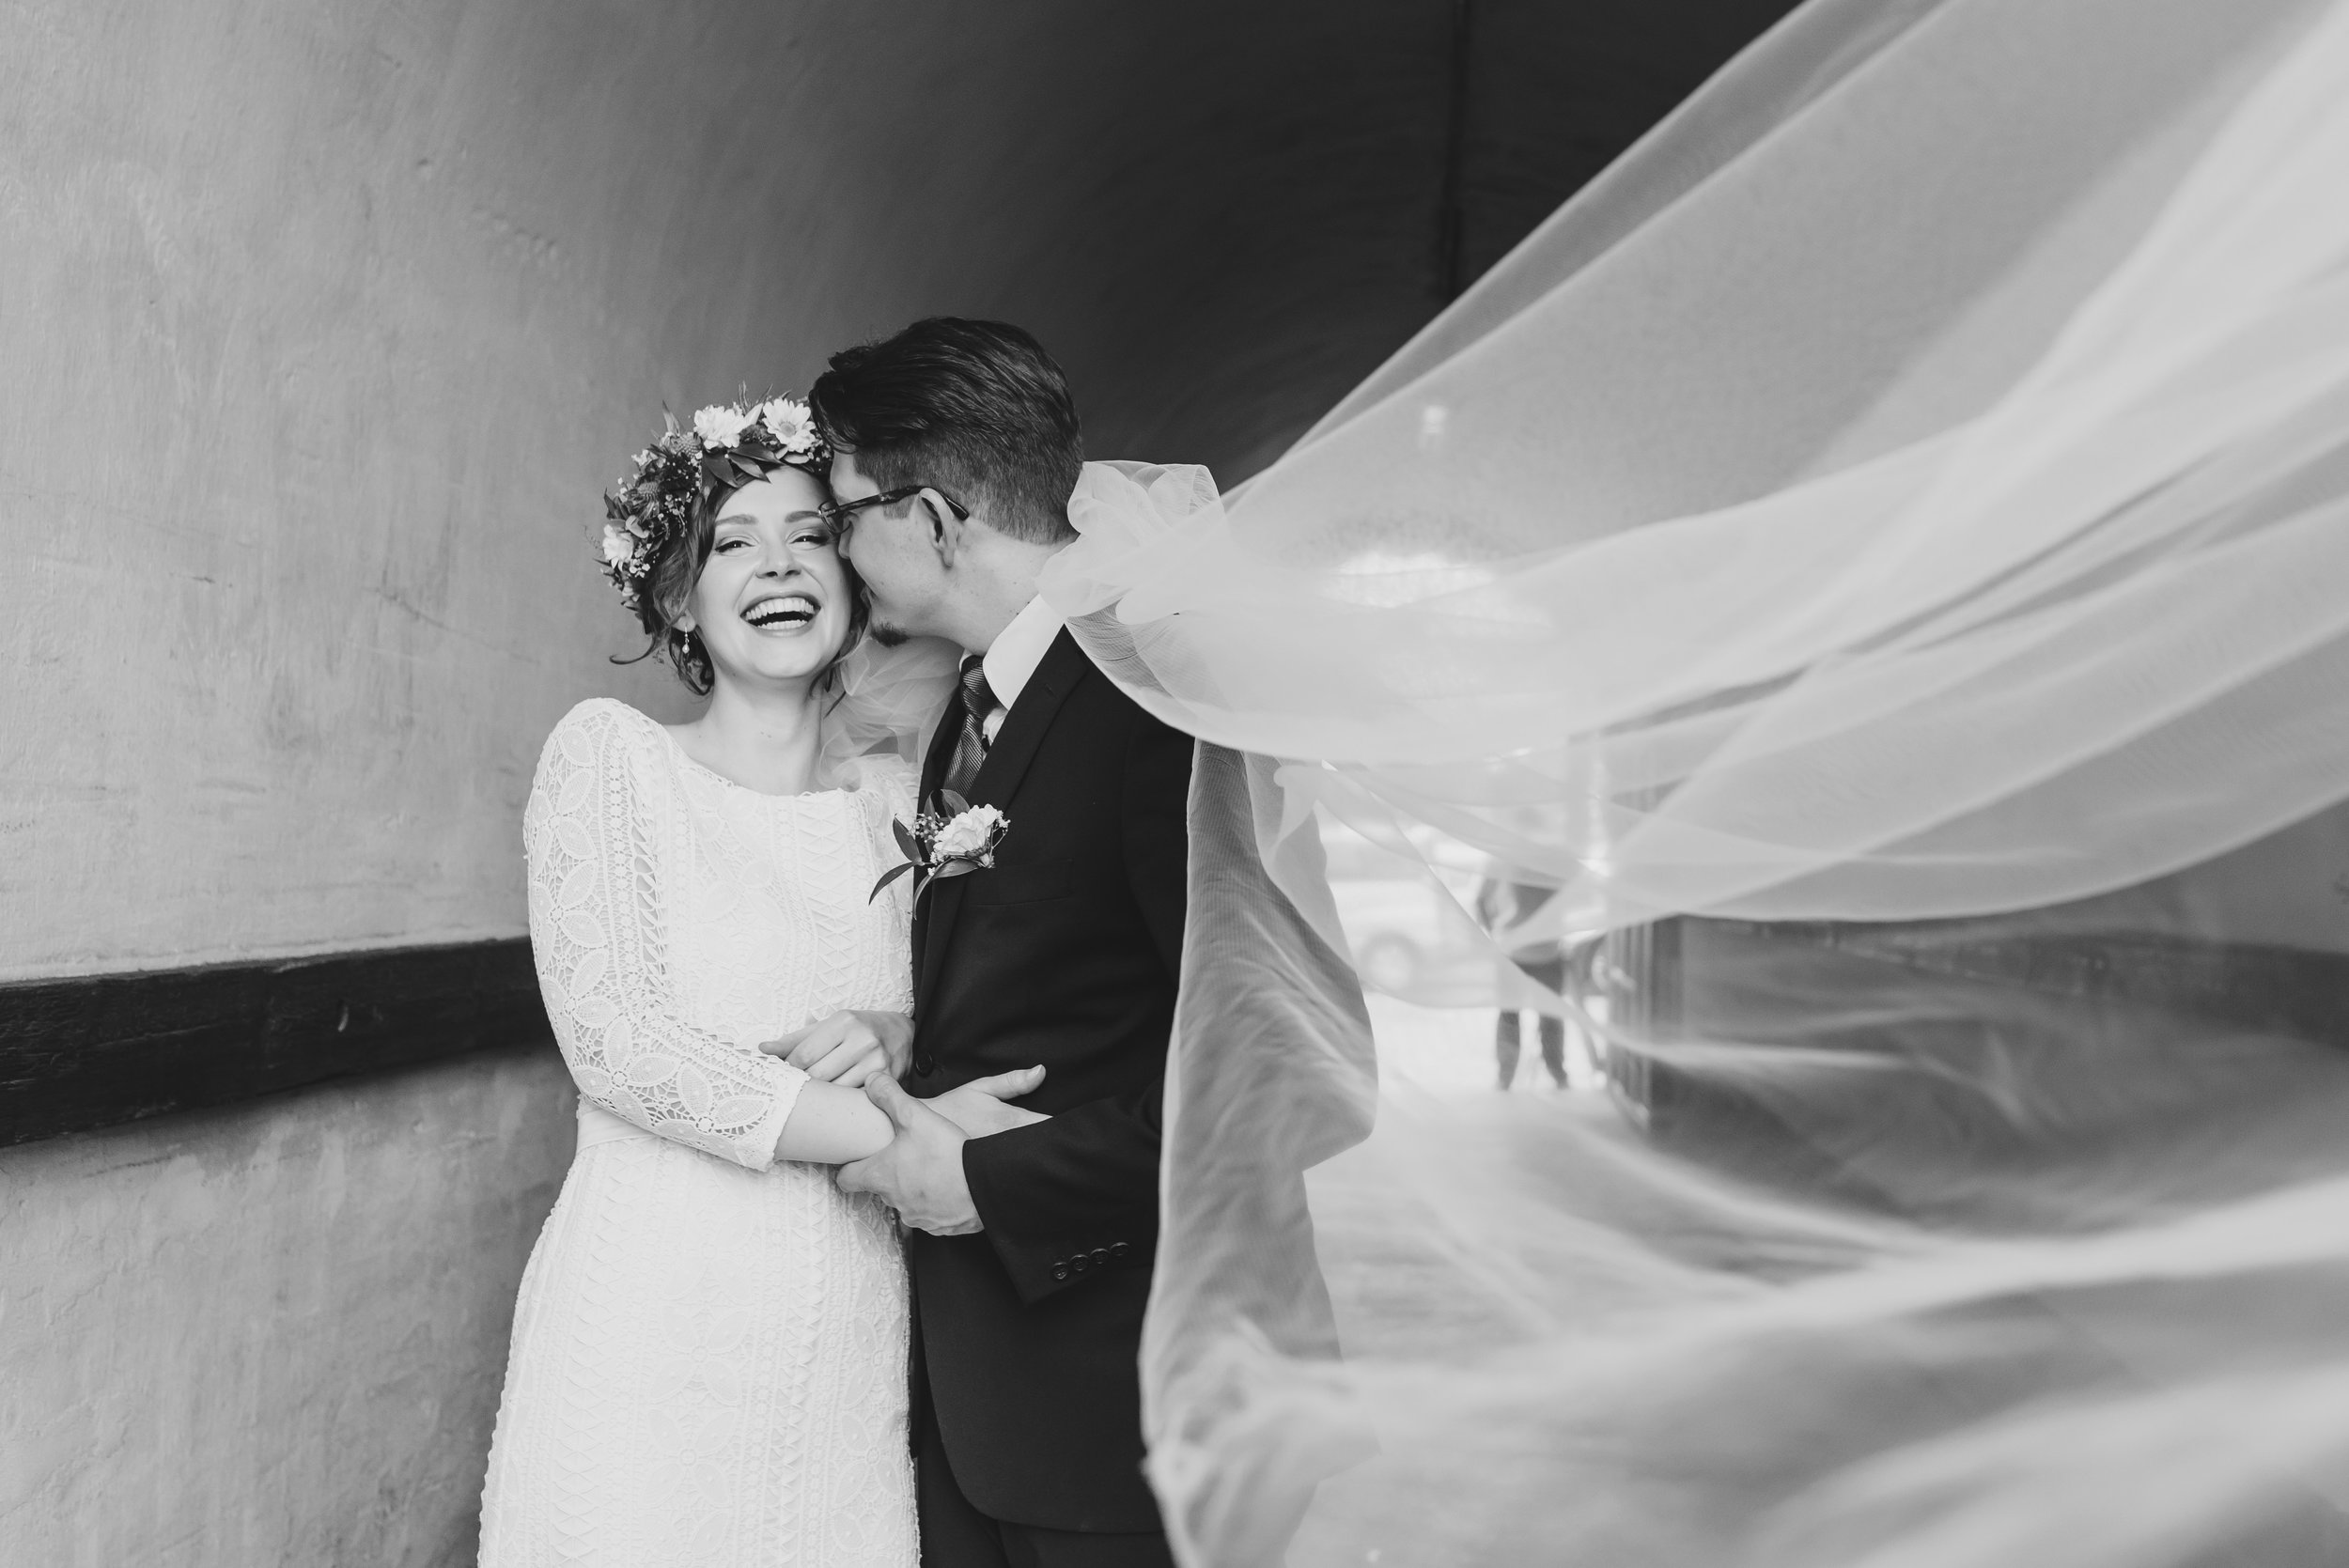 Vasa bröllopsfotograf Kavilo Photography